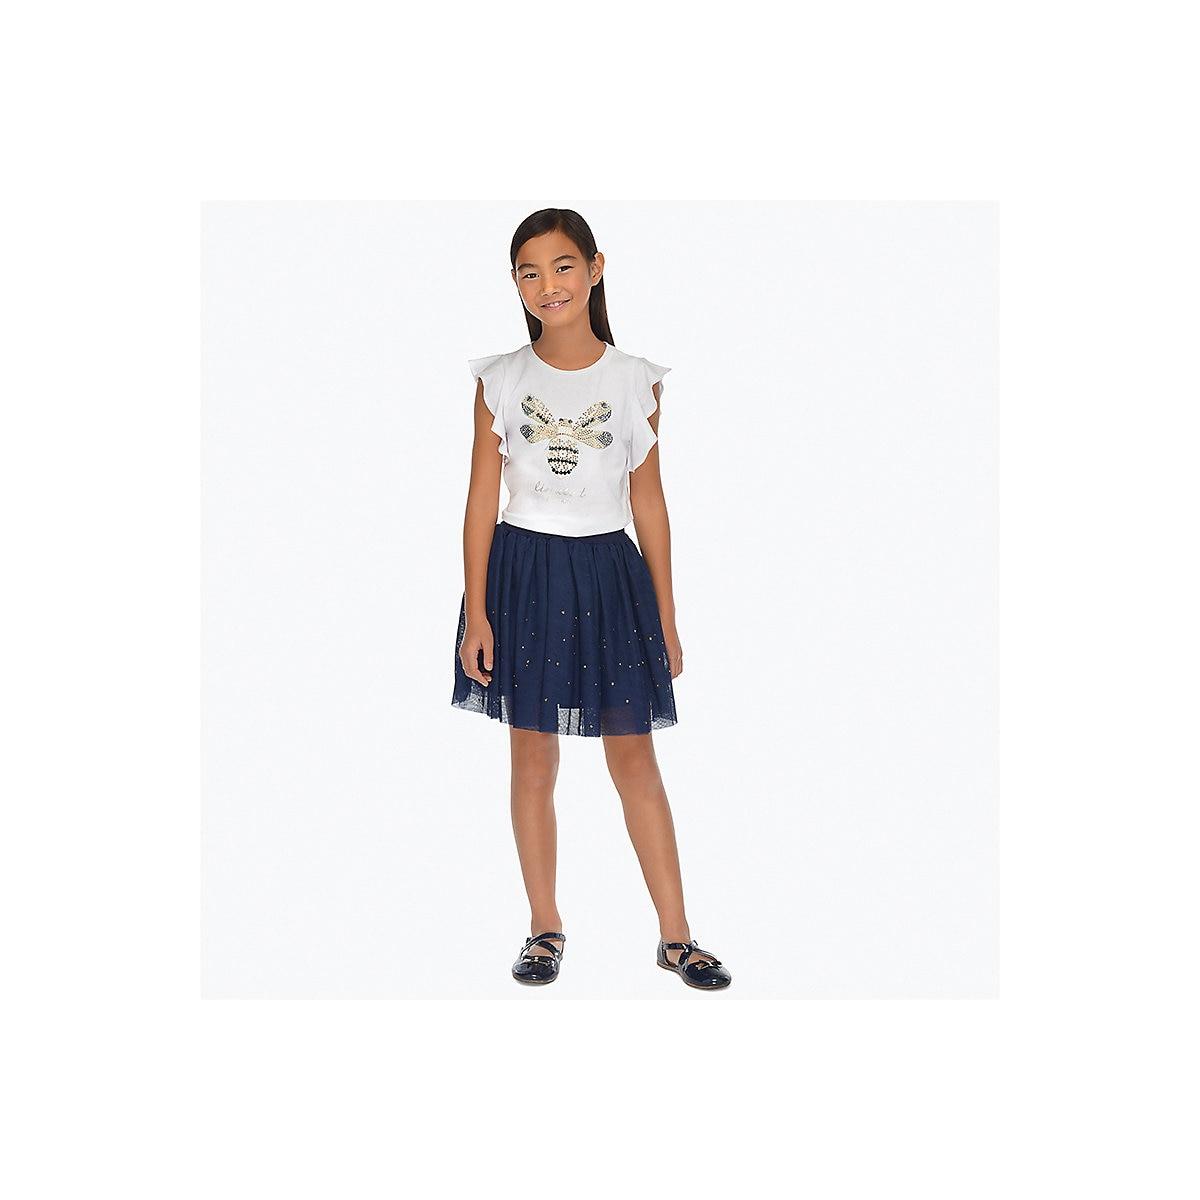 цены на MAYORAL Skirts 10678634 children clothing skirt for girls school clothes  в интернет-магазинах